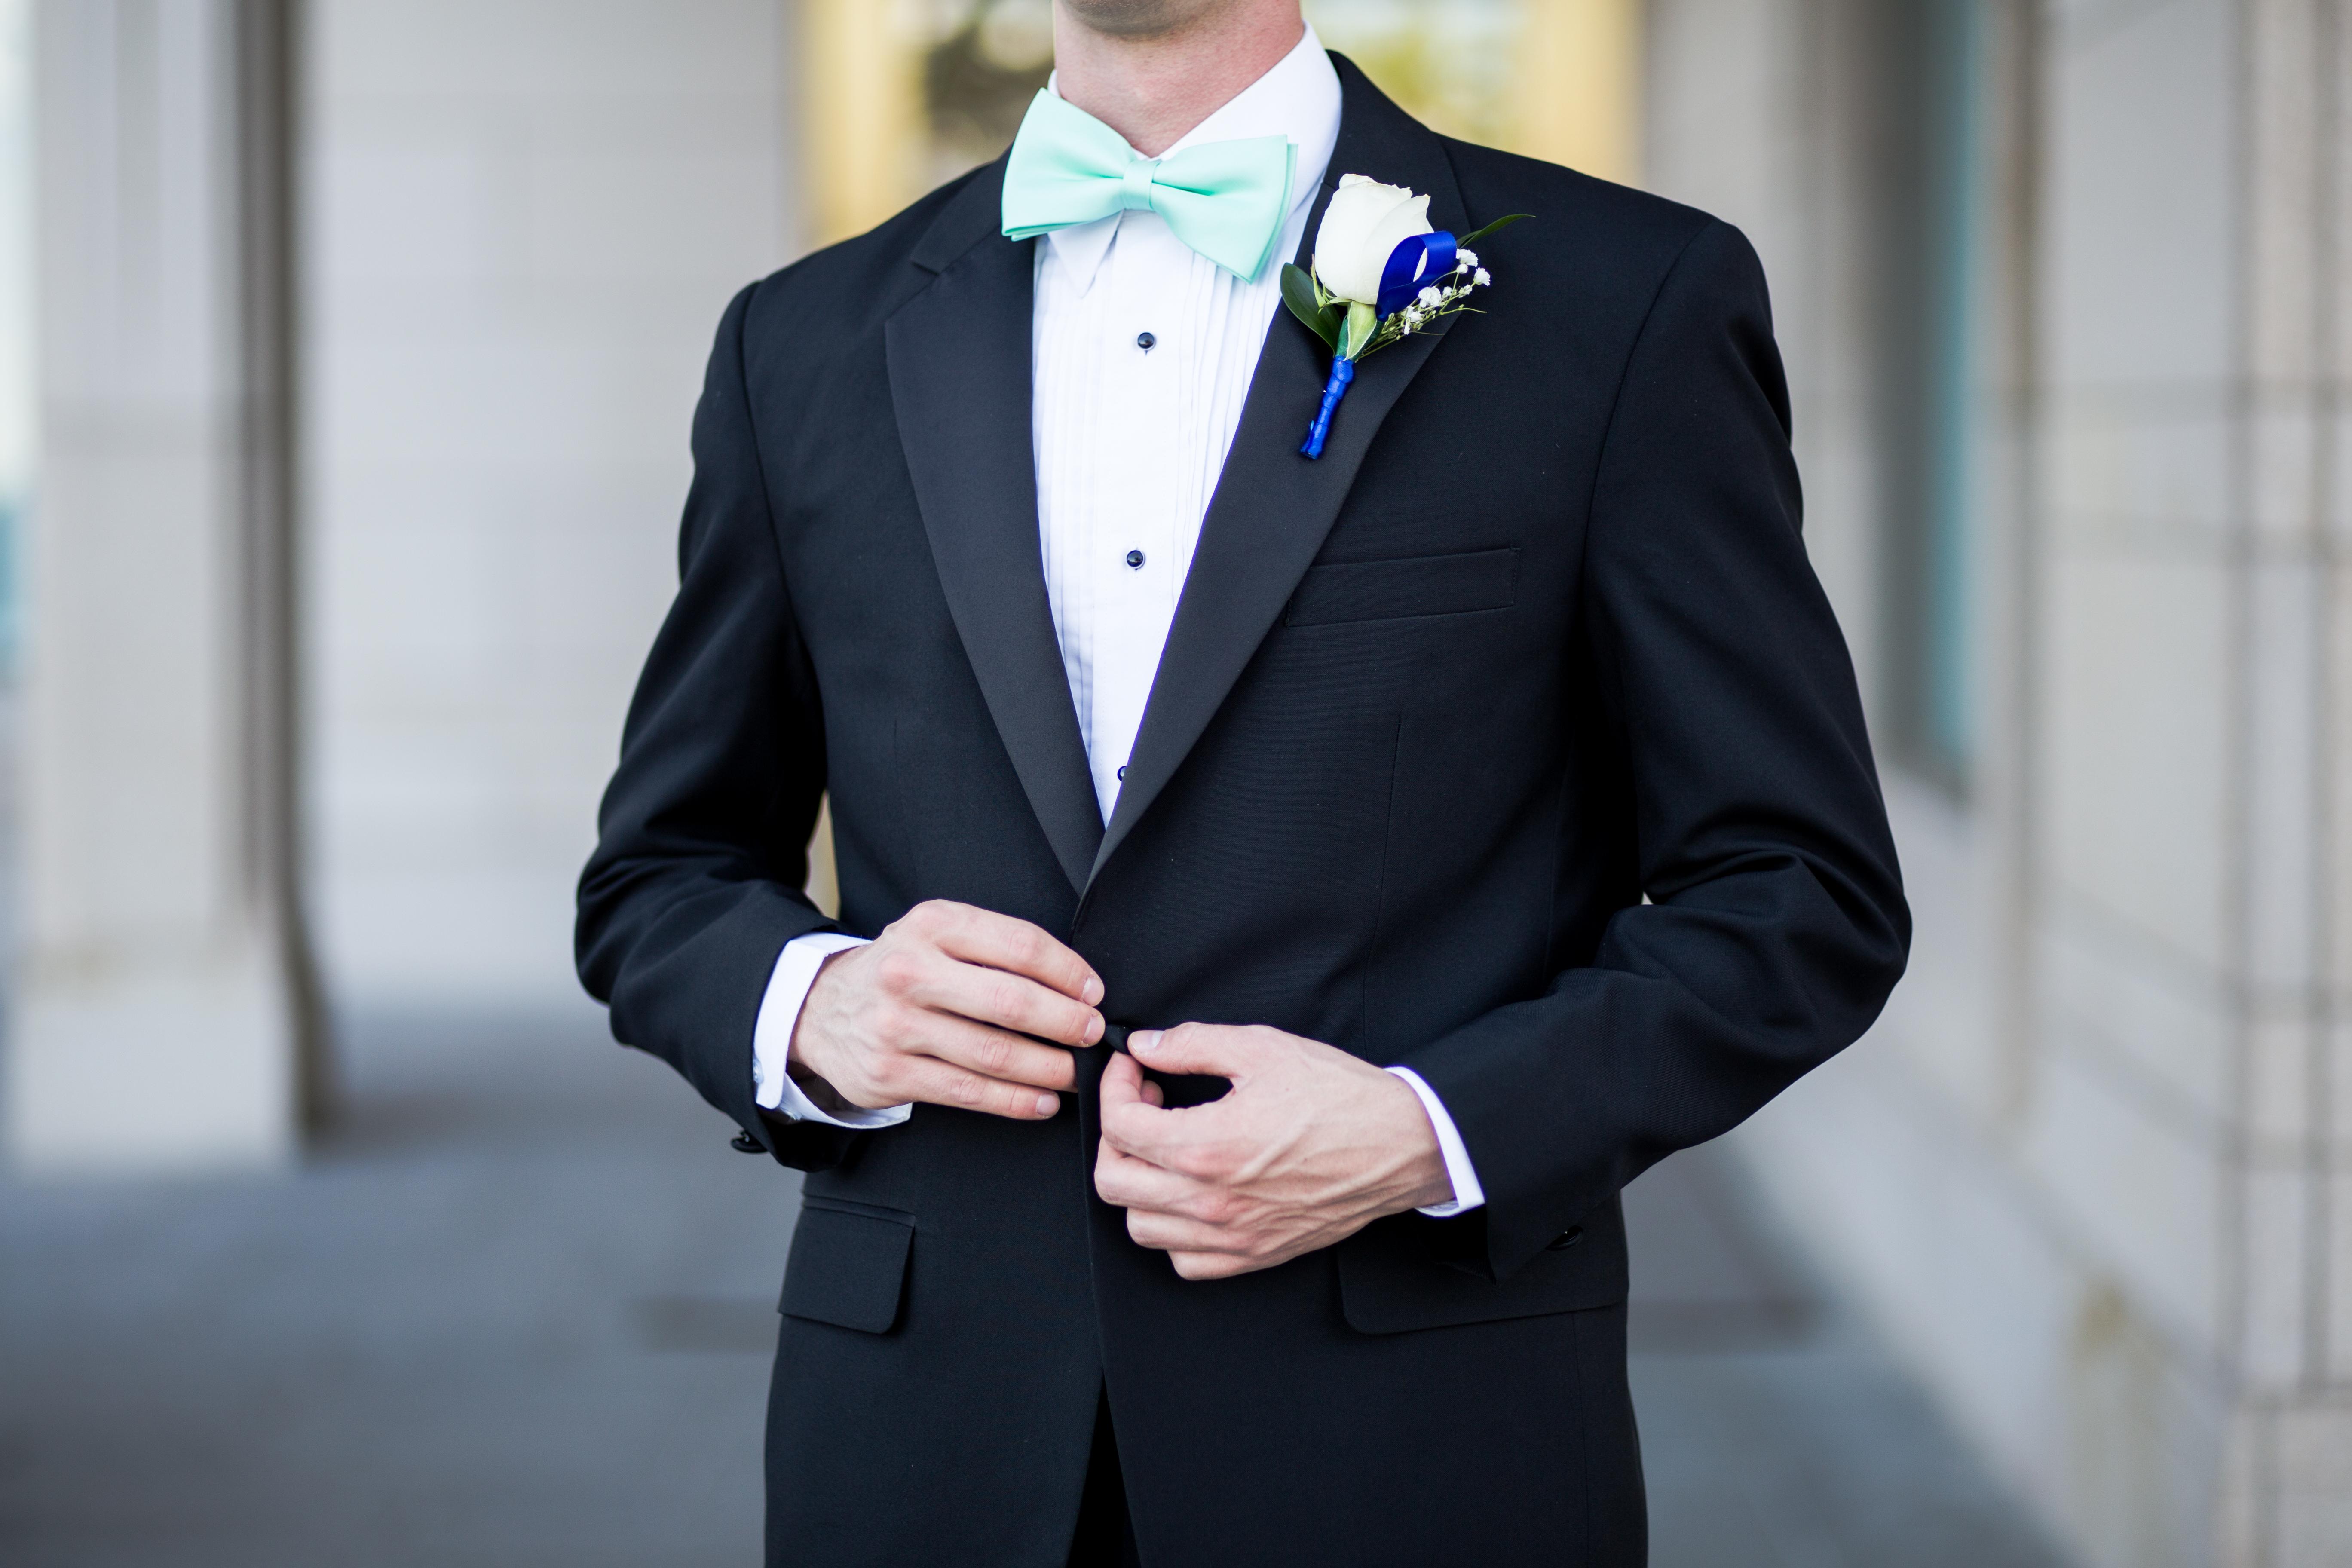 Man Wearing Black and Teal Tuxedo